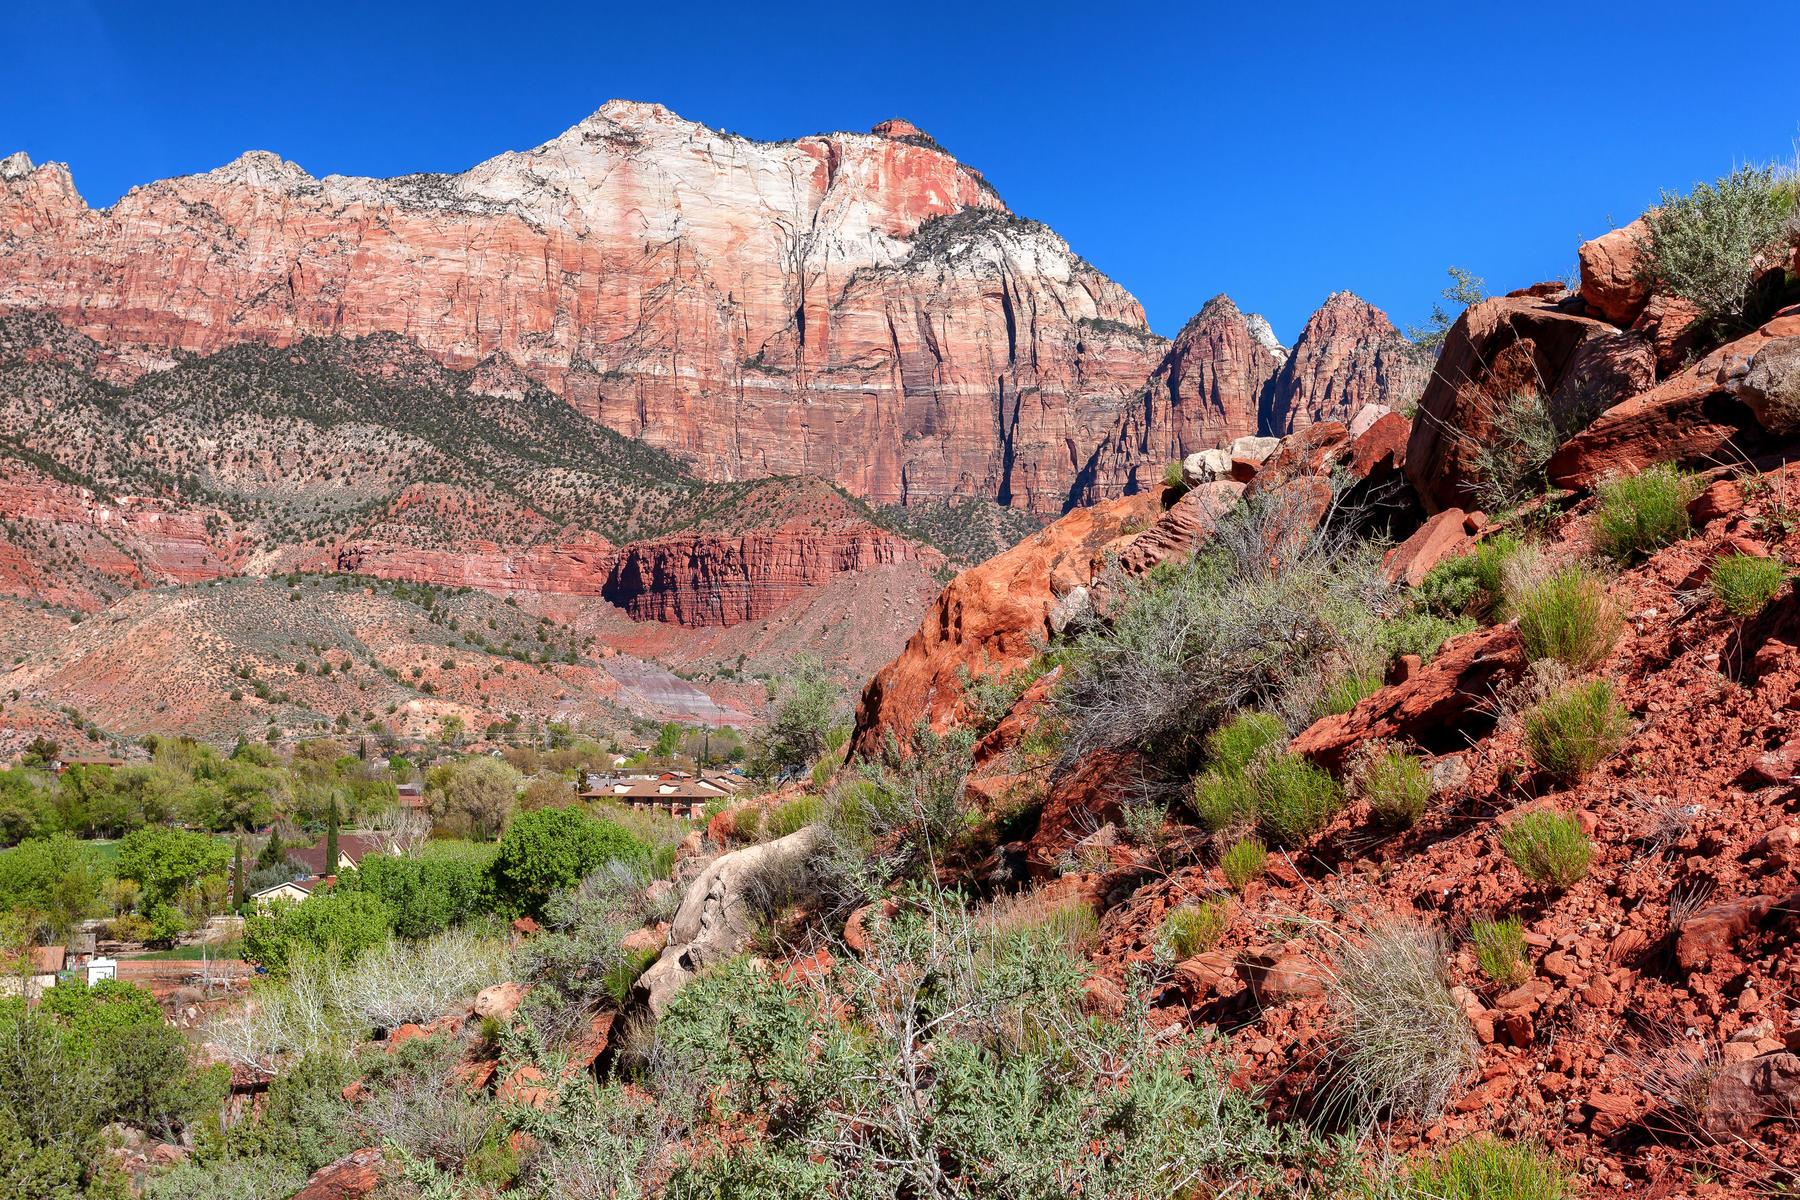 Terreno por un Venta en Gorgeous Lot Surrounded by Zion Canyon Springs Dr. Lot 37 Springdale, Utah, 84767 Estados Unidos